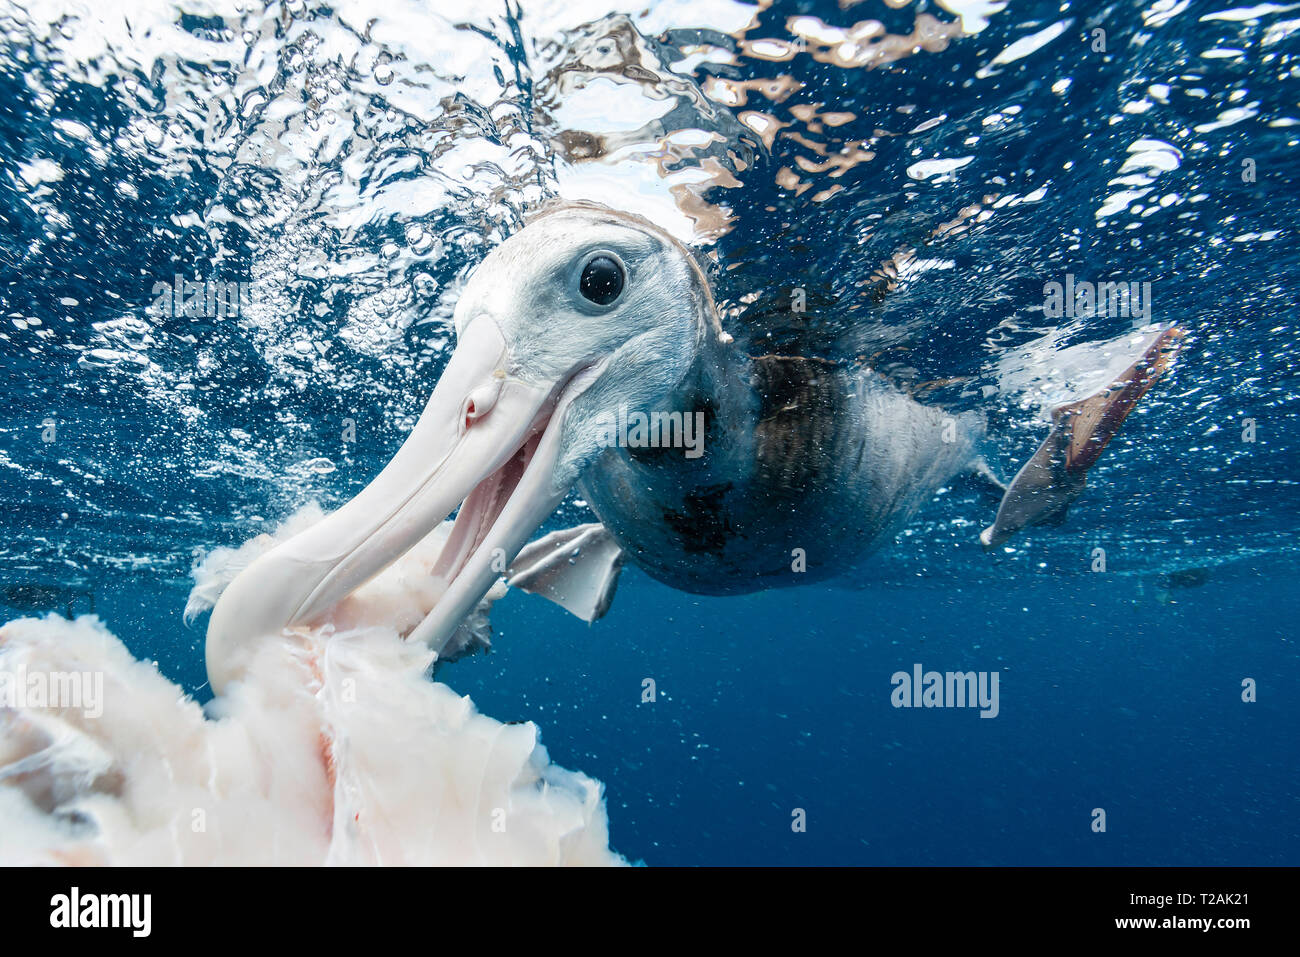 Antipodean albatross feeding on fish scraps from local fishermen, Pacific Ocean North Island, New Zealand. - Stock Image